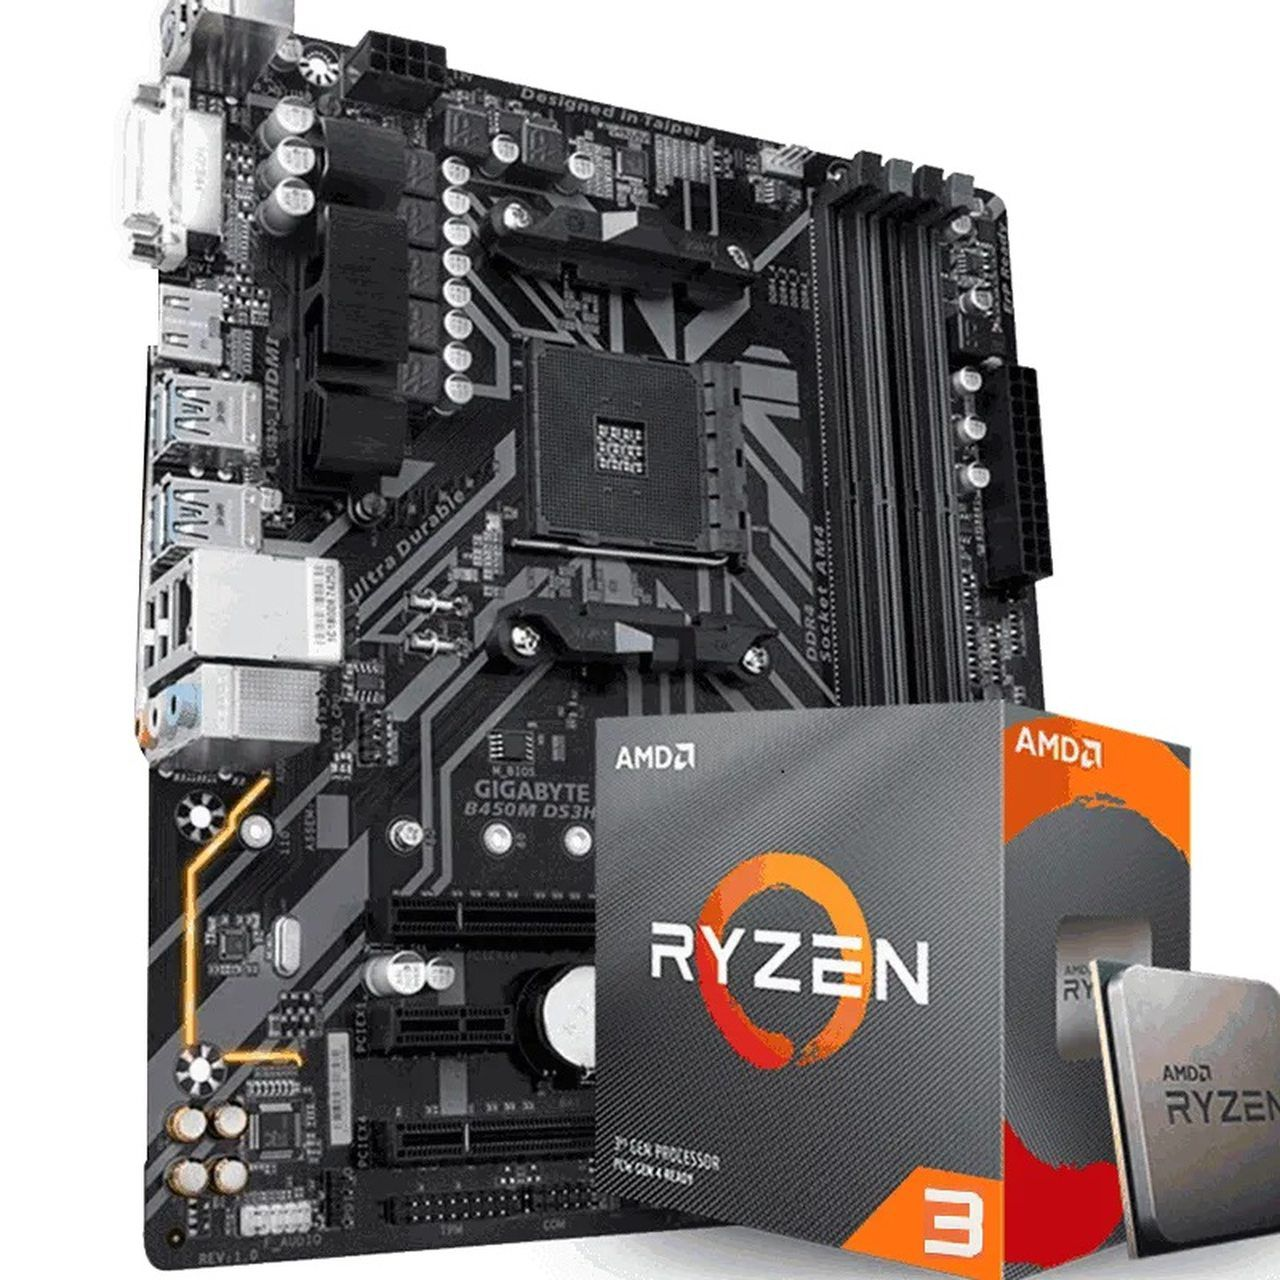 KIT UPGRADE PROCESSADOR AMD RYZEN 3 3200G / PLACA MÃE GIGABYTE B450M DS3H